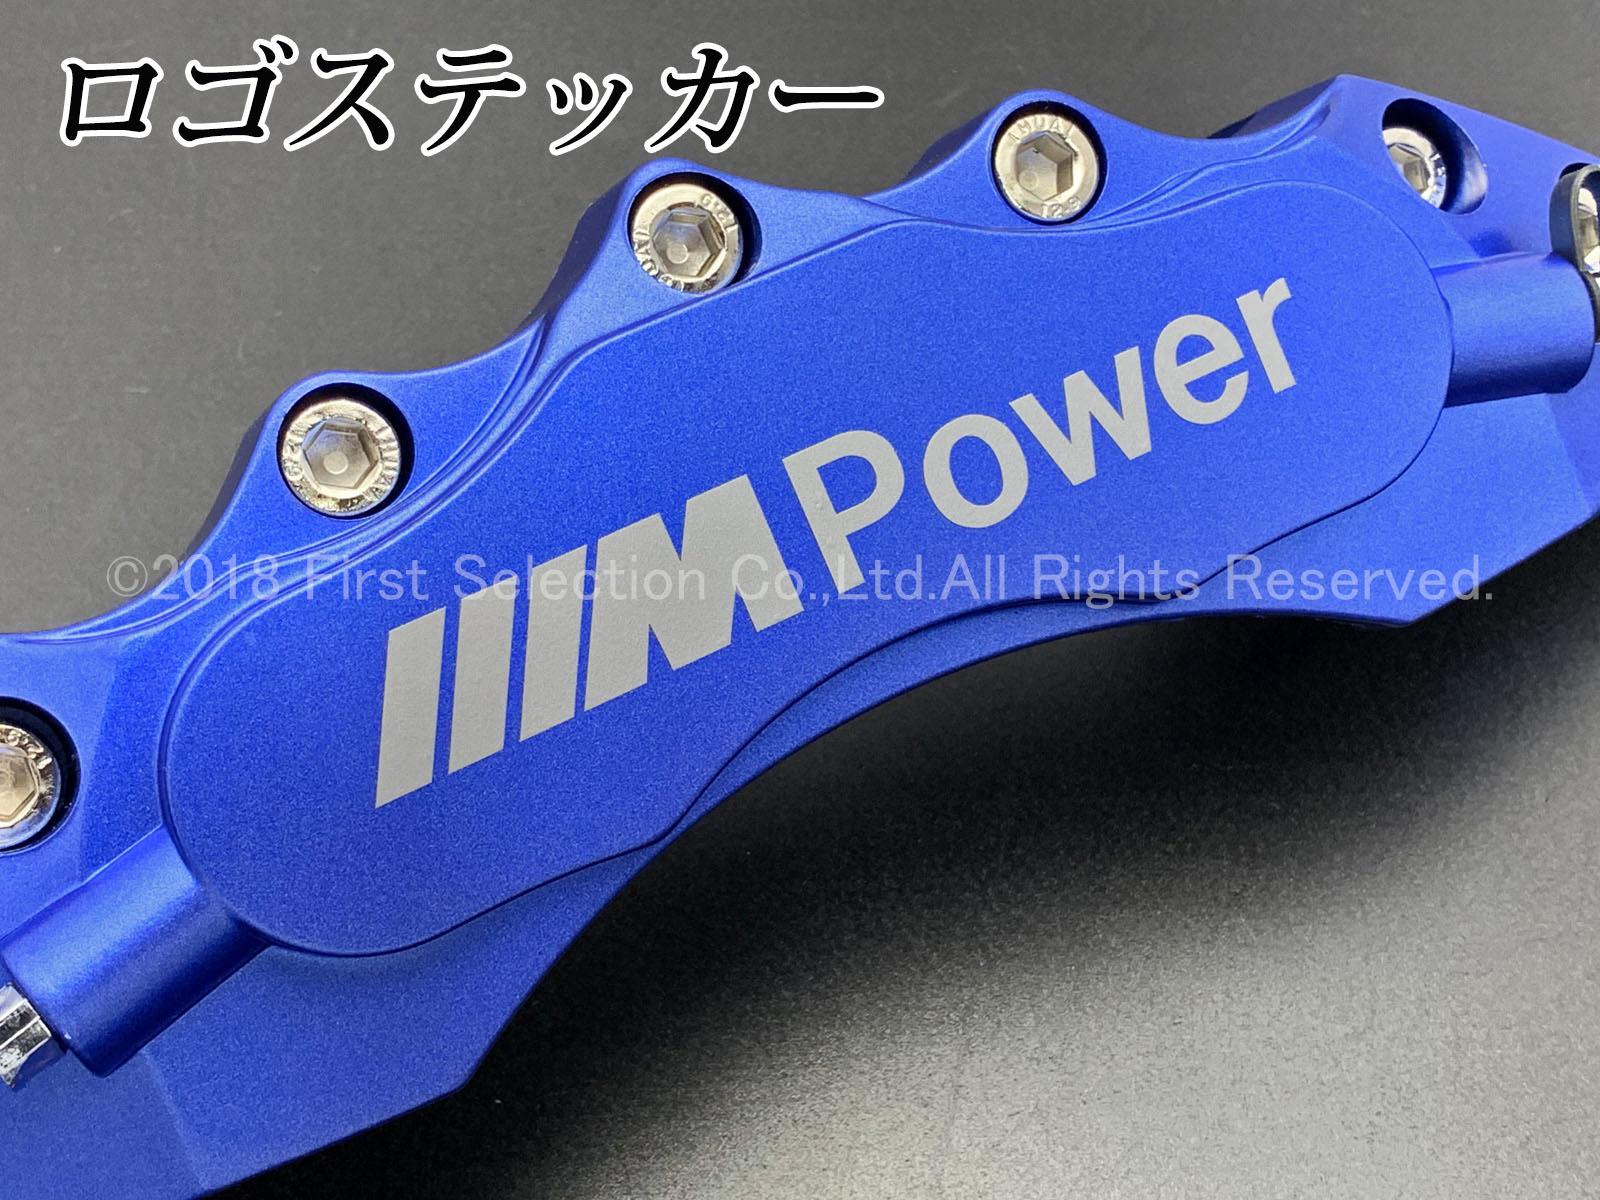 BMW車 ///M Power銀文字 汎用高品質キャリパーカバーL/Mサイズセット M青 メタリックブルー